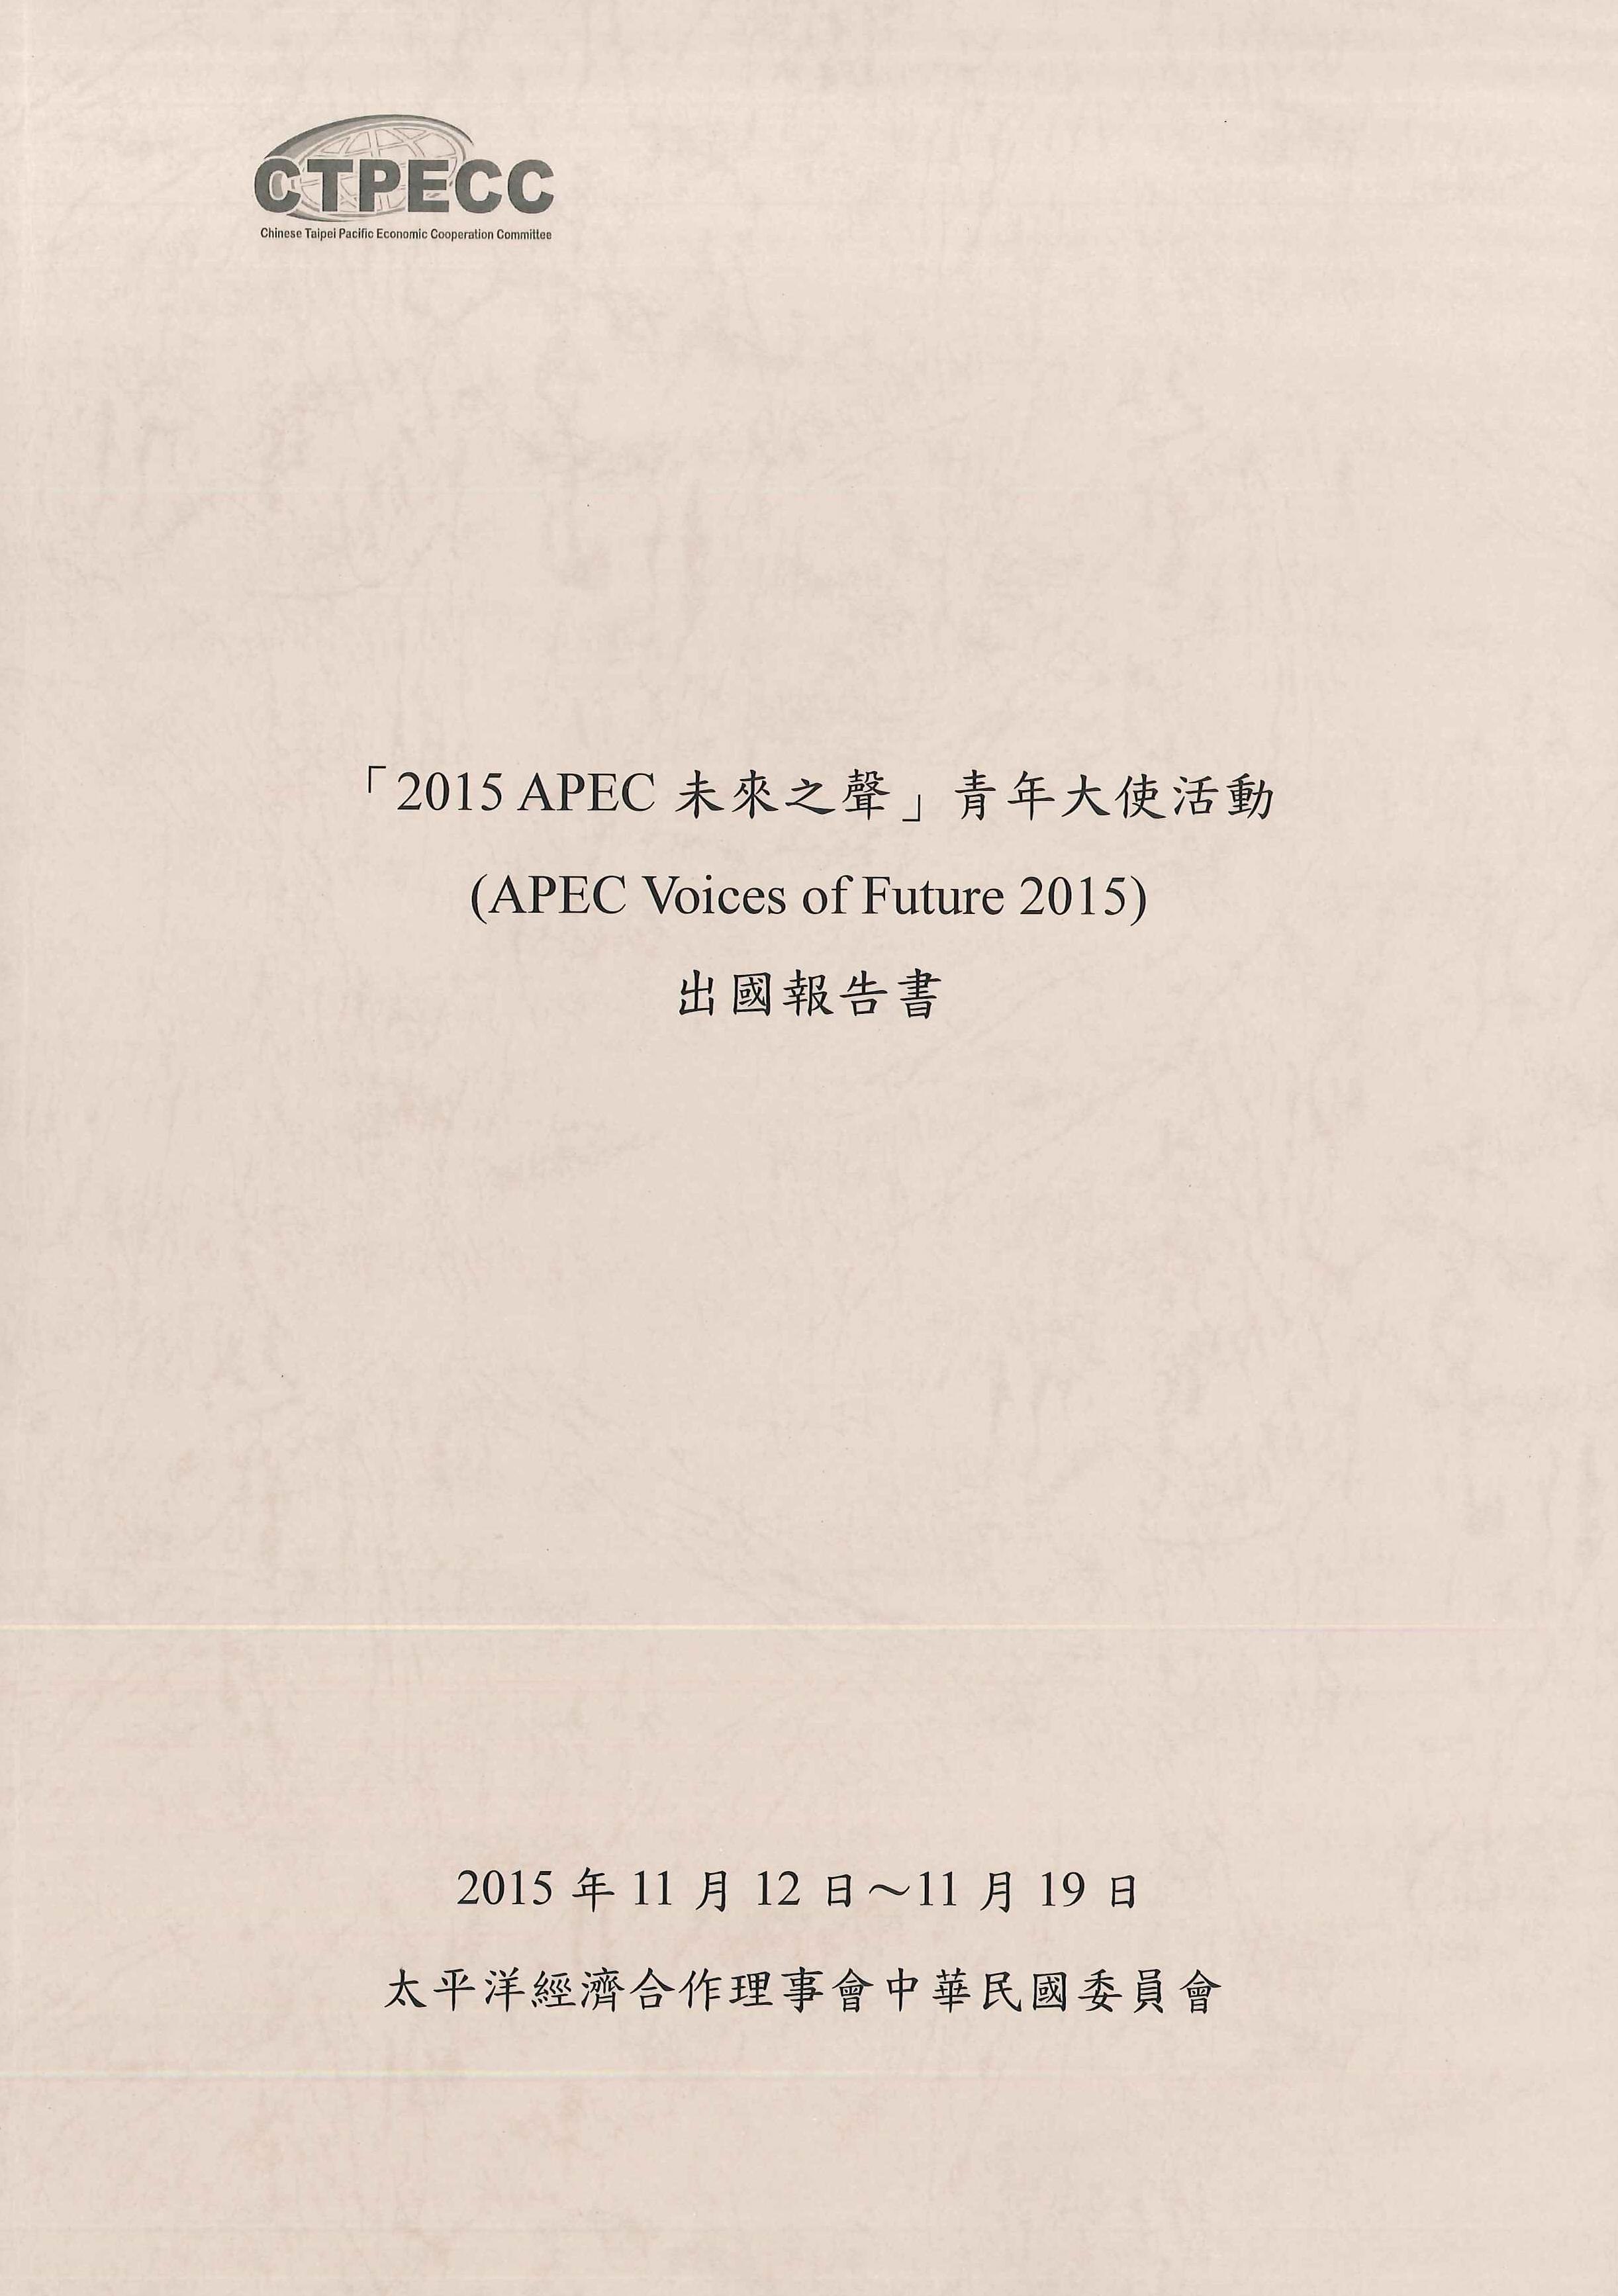 「2015 APEC未來之聲」青年大使活動出國報告書=APEC voices of future 2015